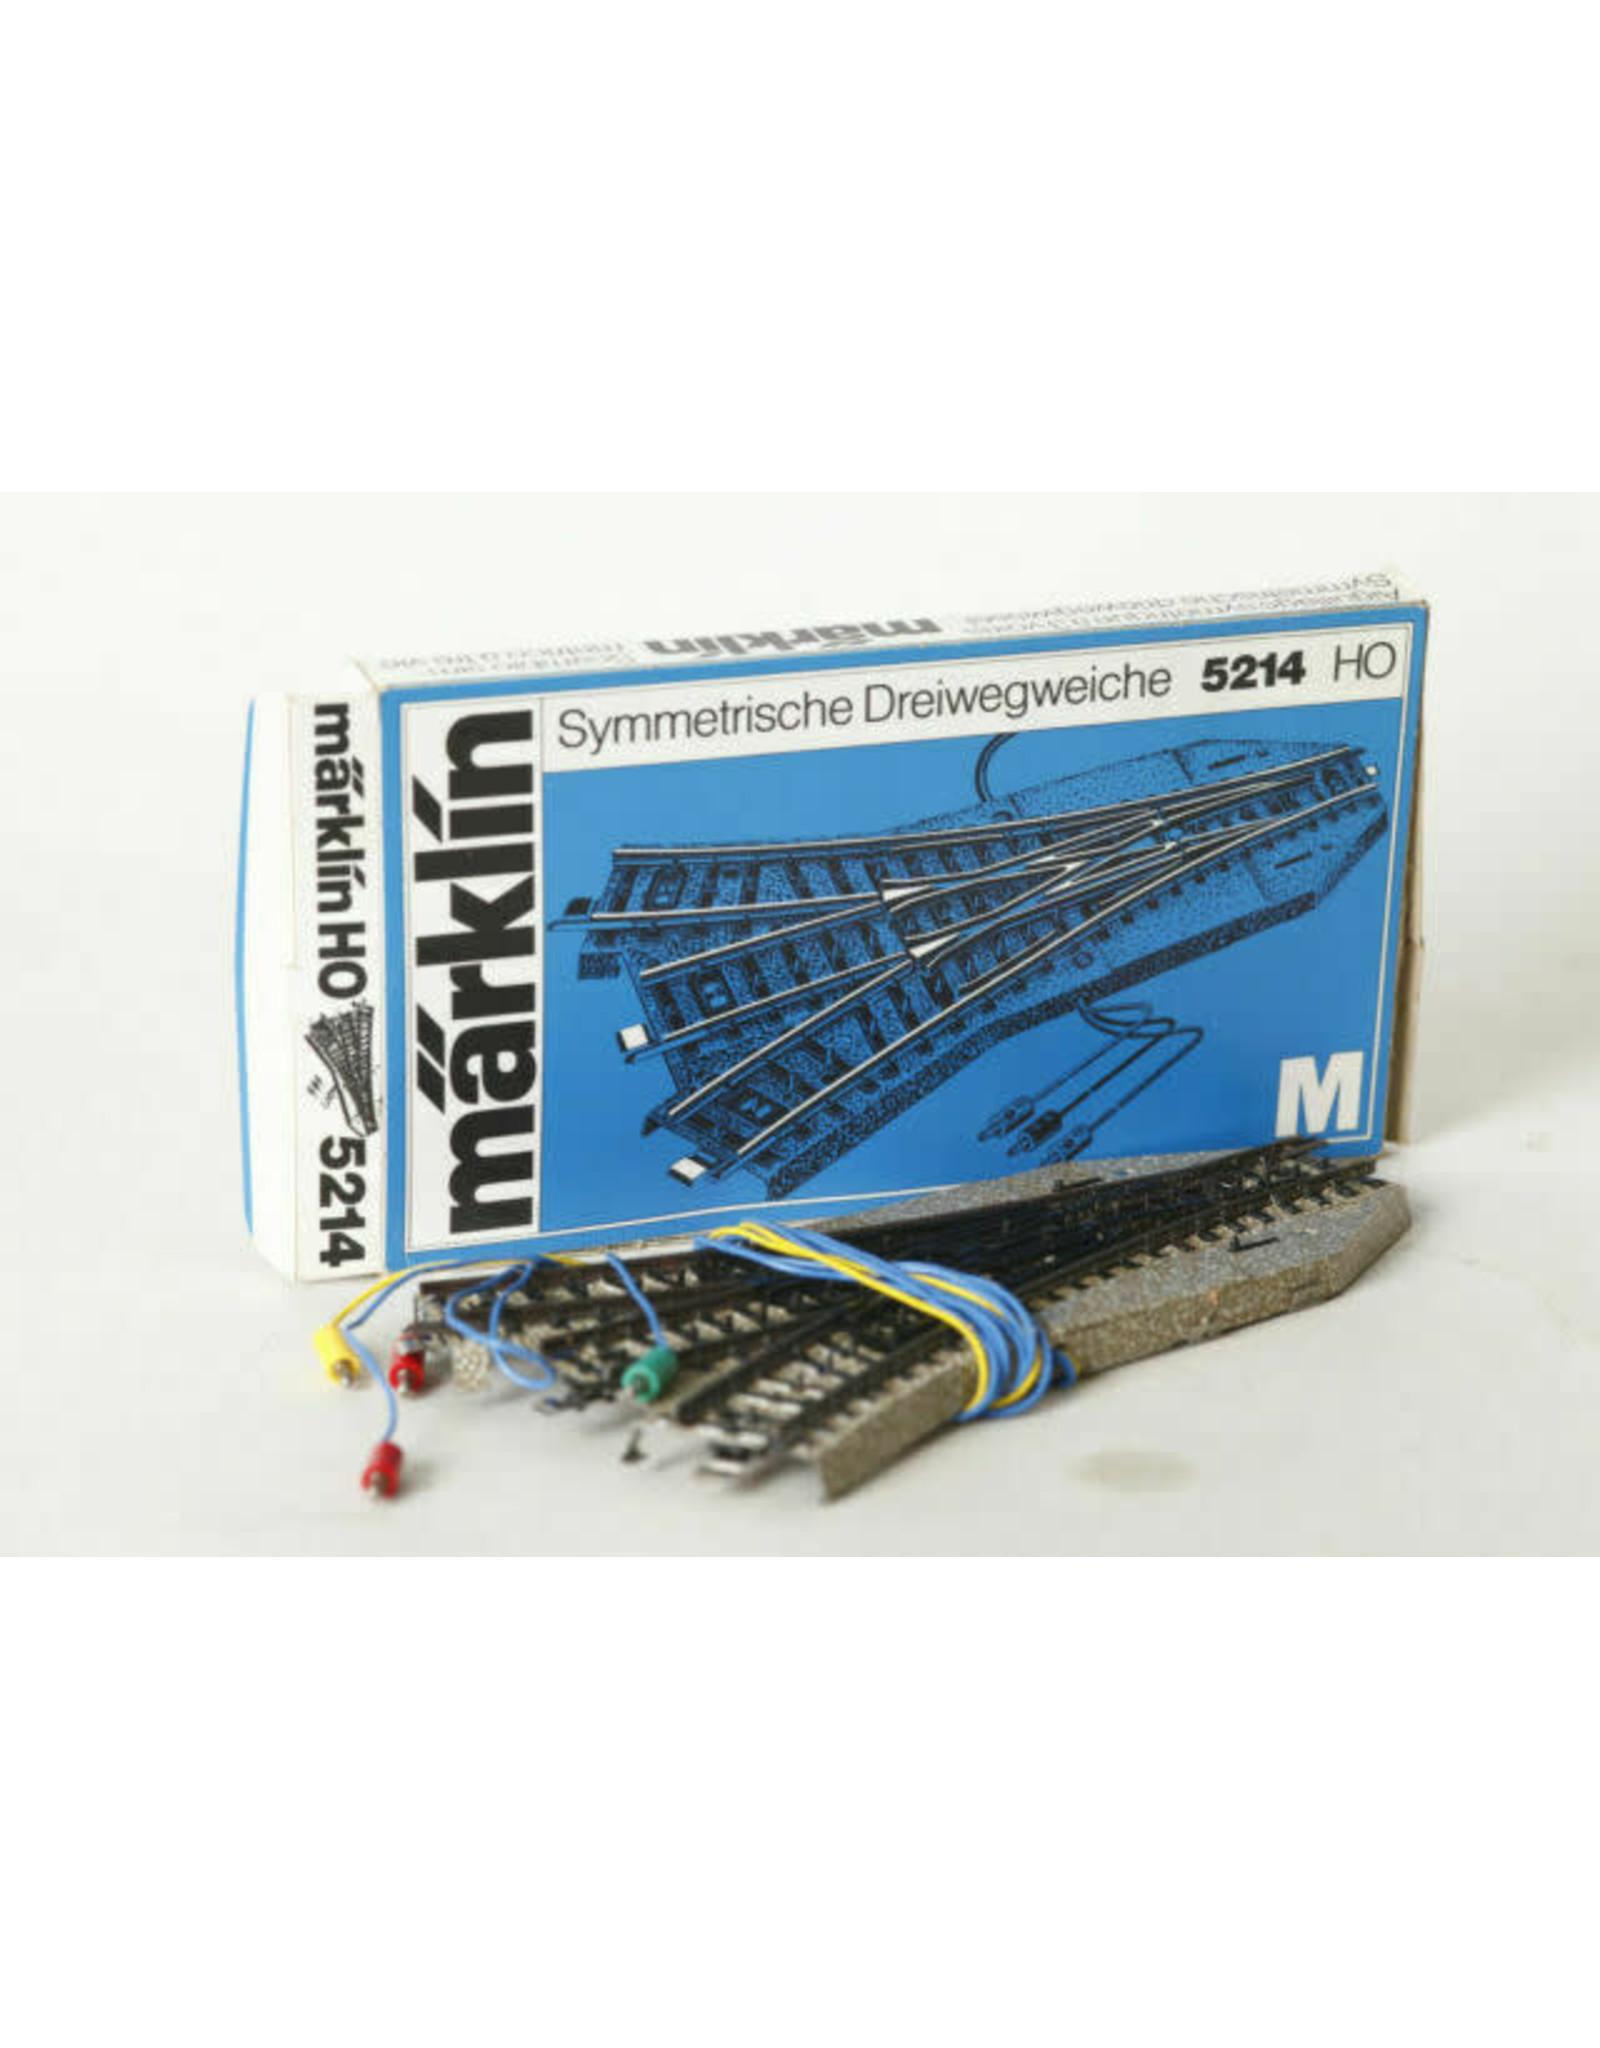 Marklin Marklin HO Part 5214 M Track Symmetrical Three Way Turnout Solenoid Operated